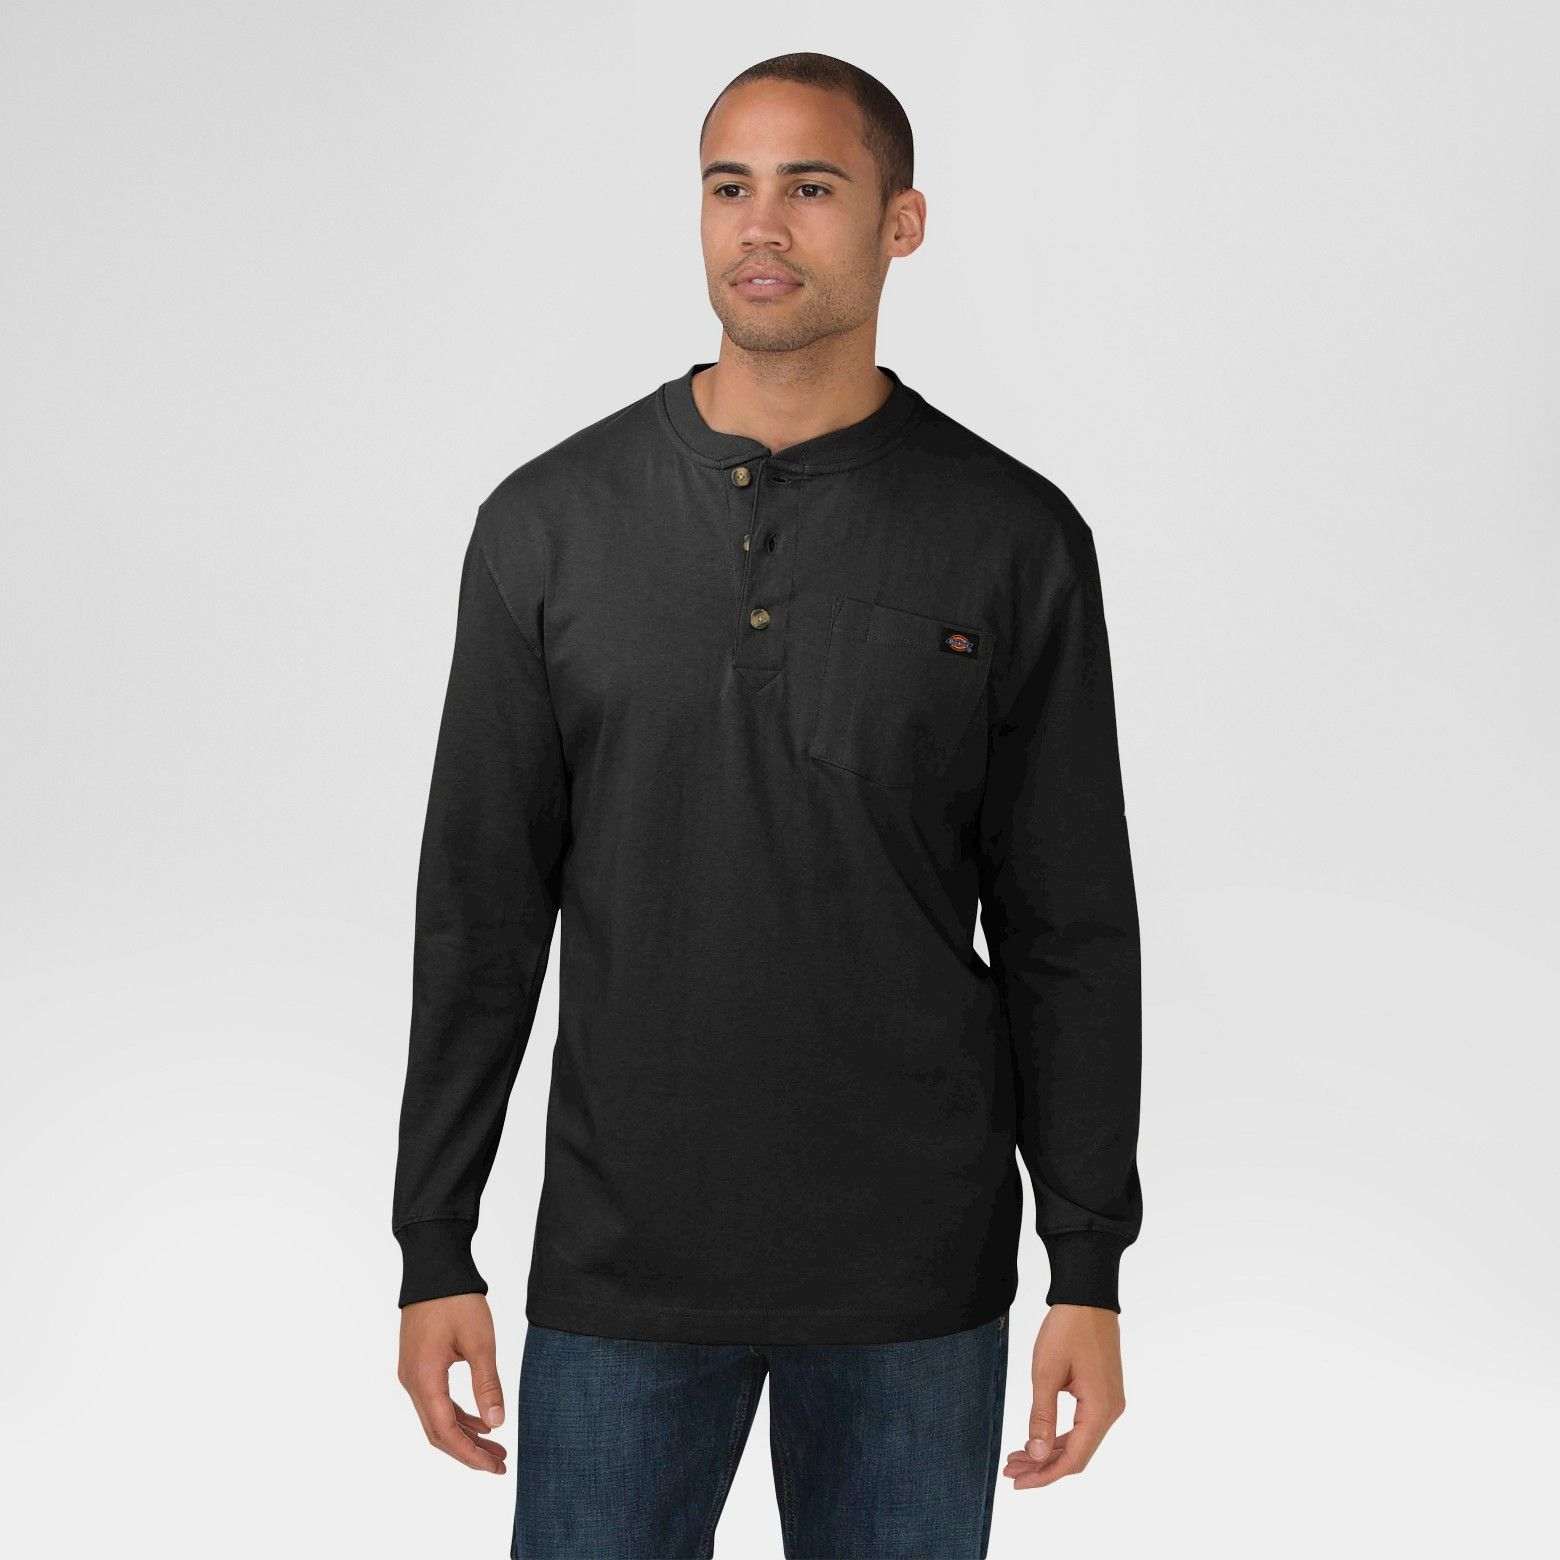 Dickies Men S Cotton Heavyweight Long Sleeve Pocket Henley Shirt Henley Shirts Women S Henley Henley